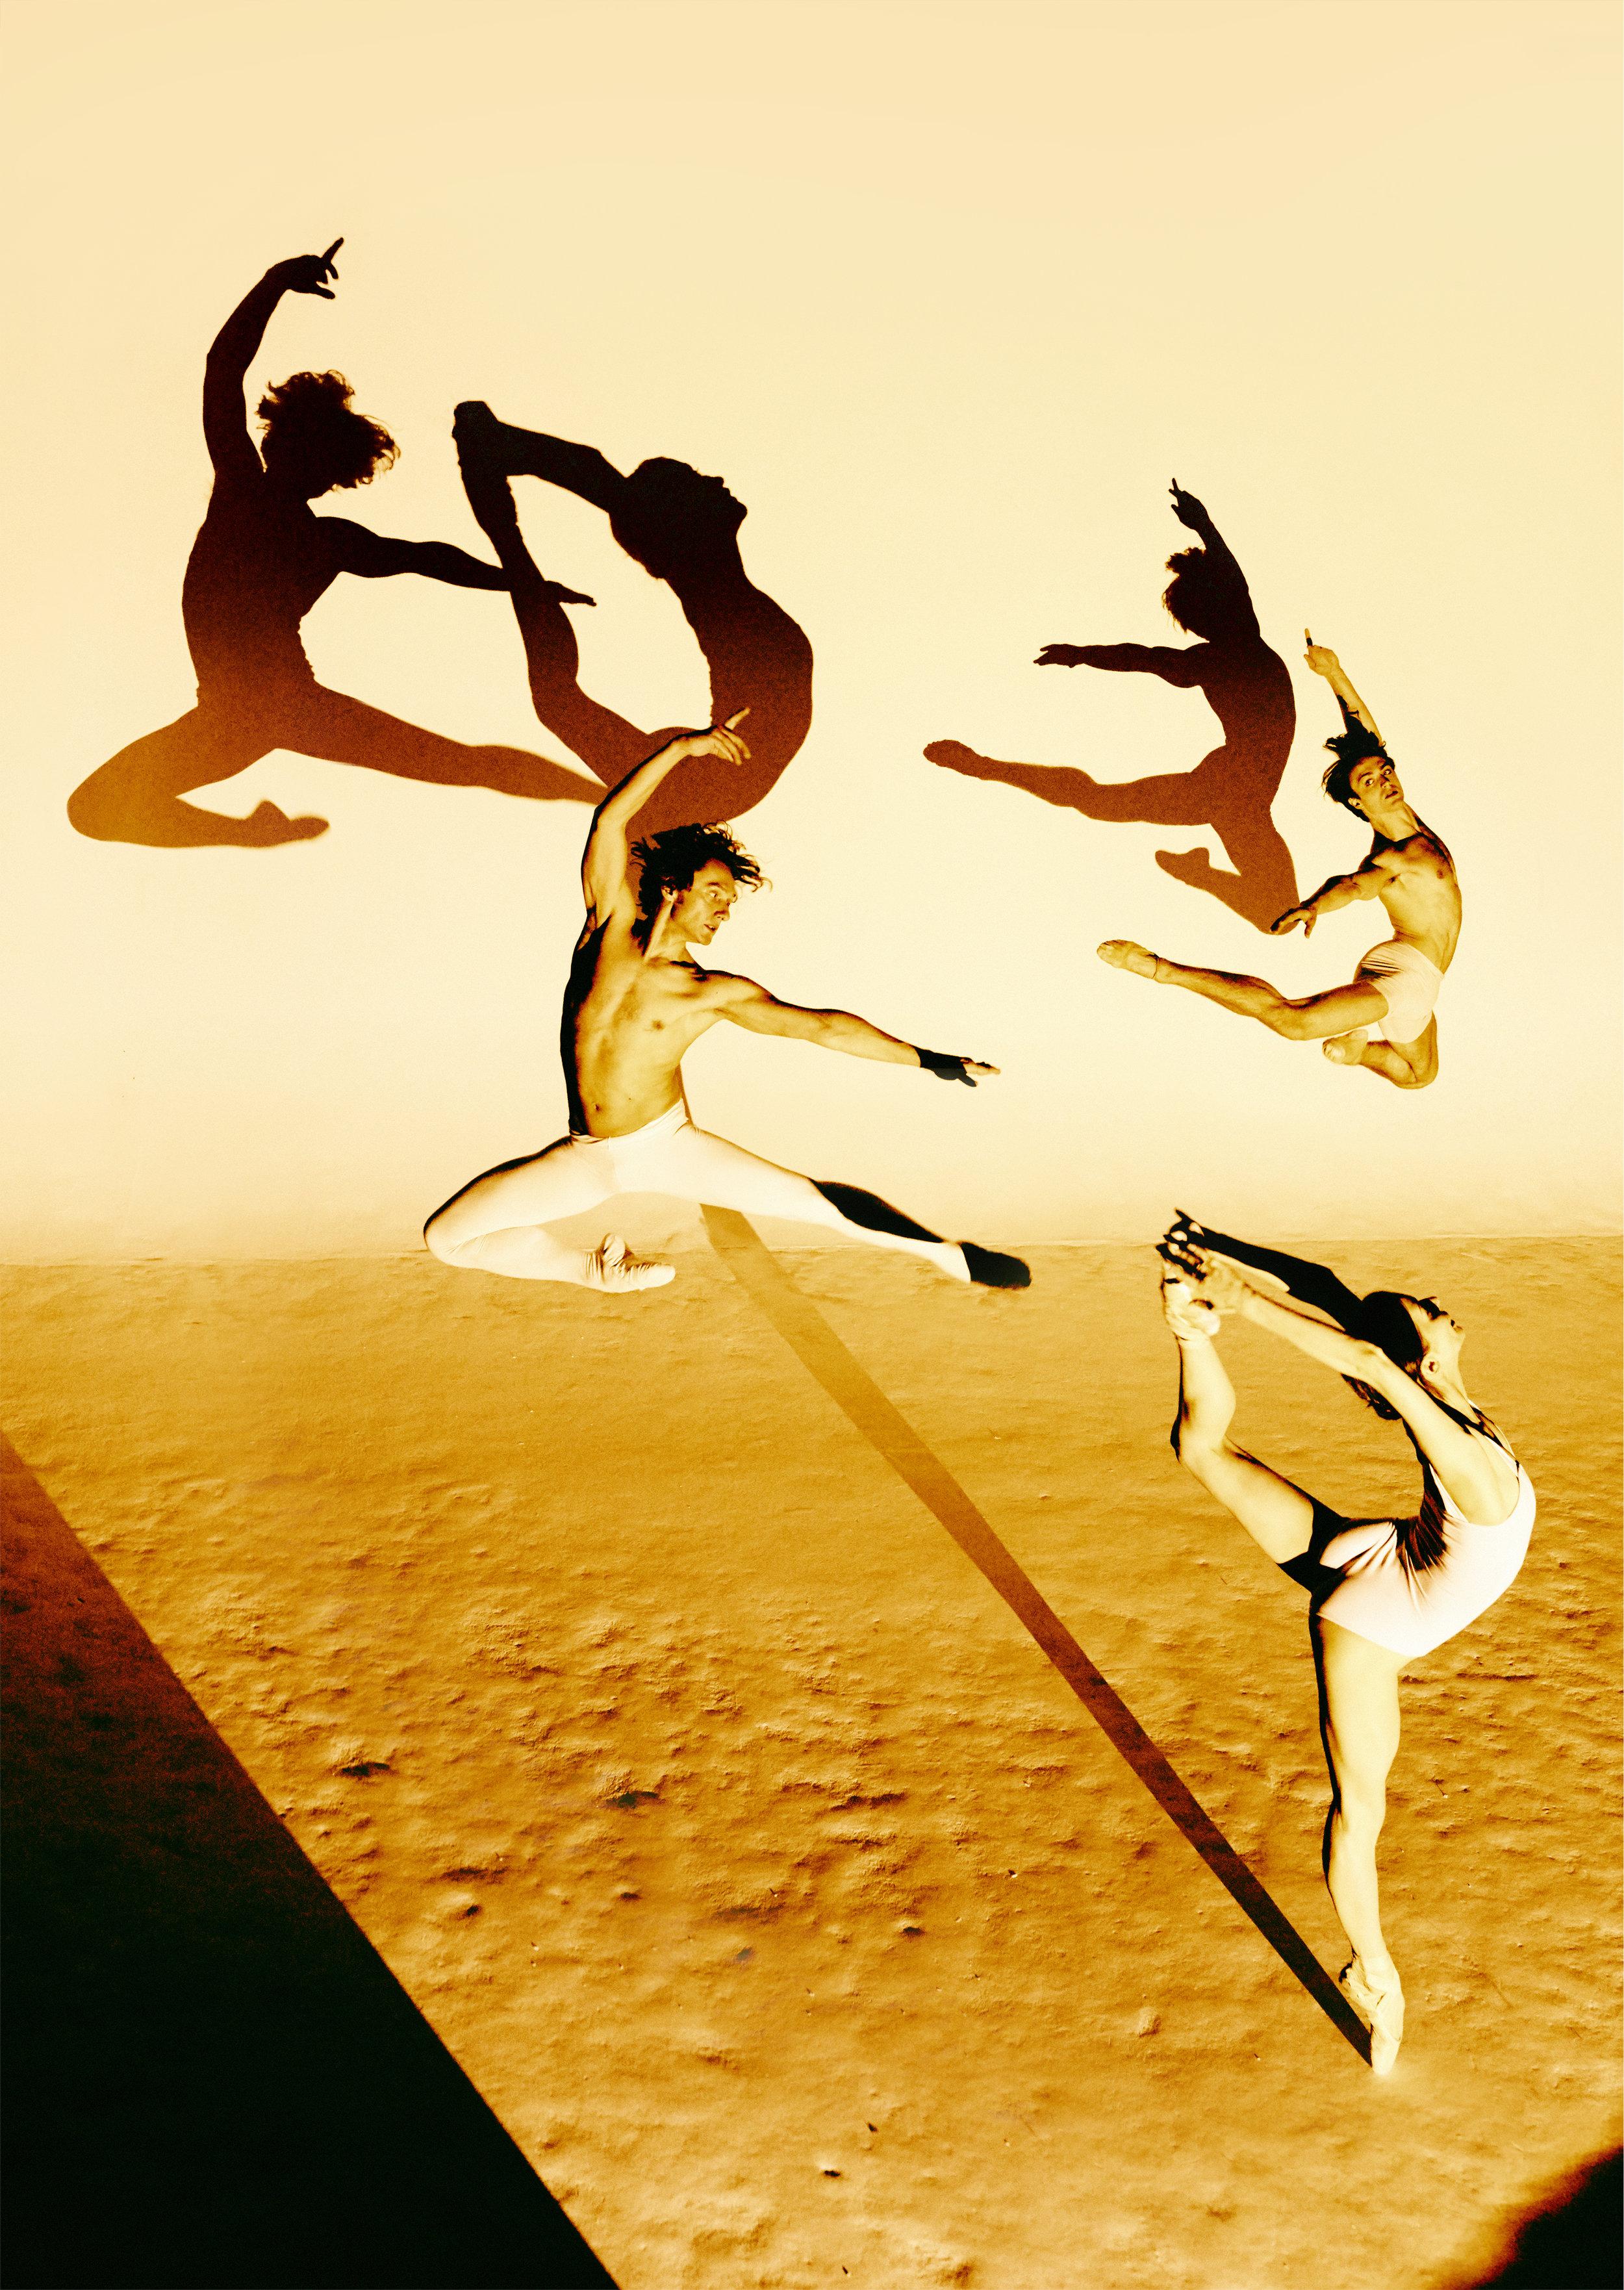 181028_BrittLloyd_Dancers_Sh03_1161_V1.jpg